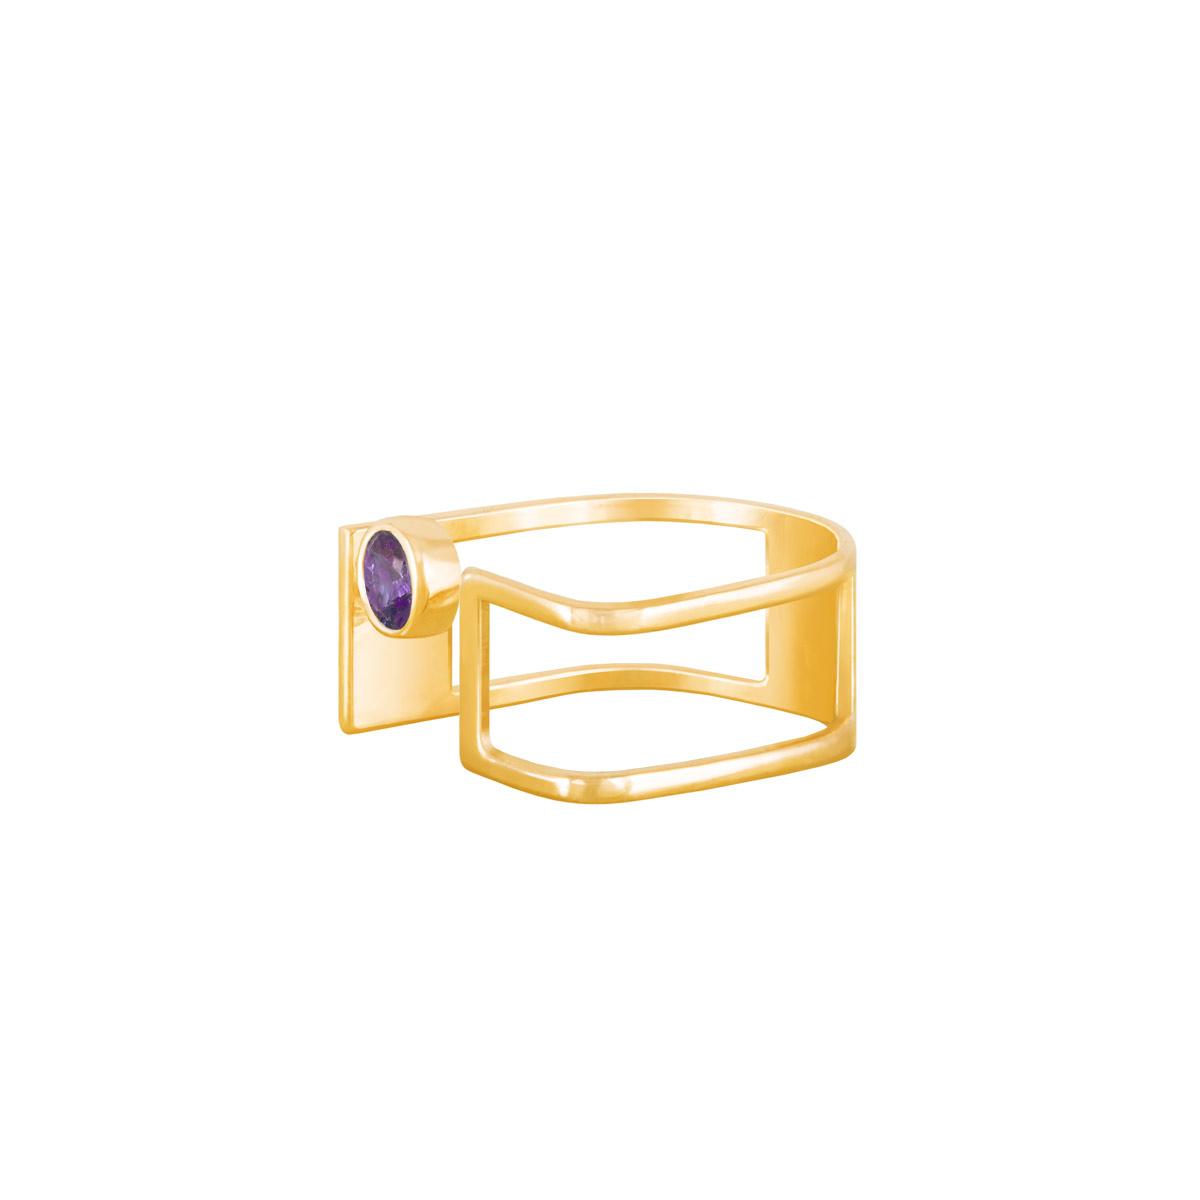 انگشتر طلا دایره بنفش پرسته